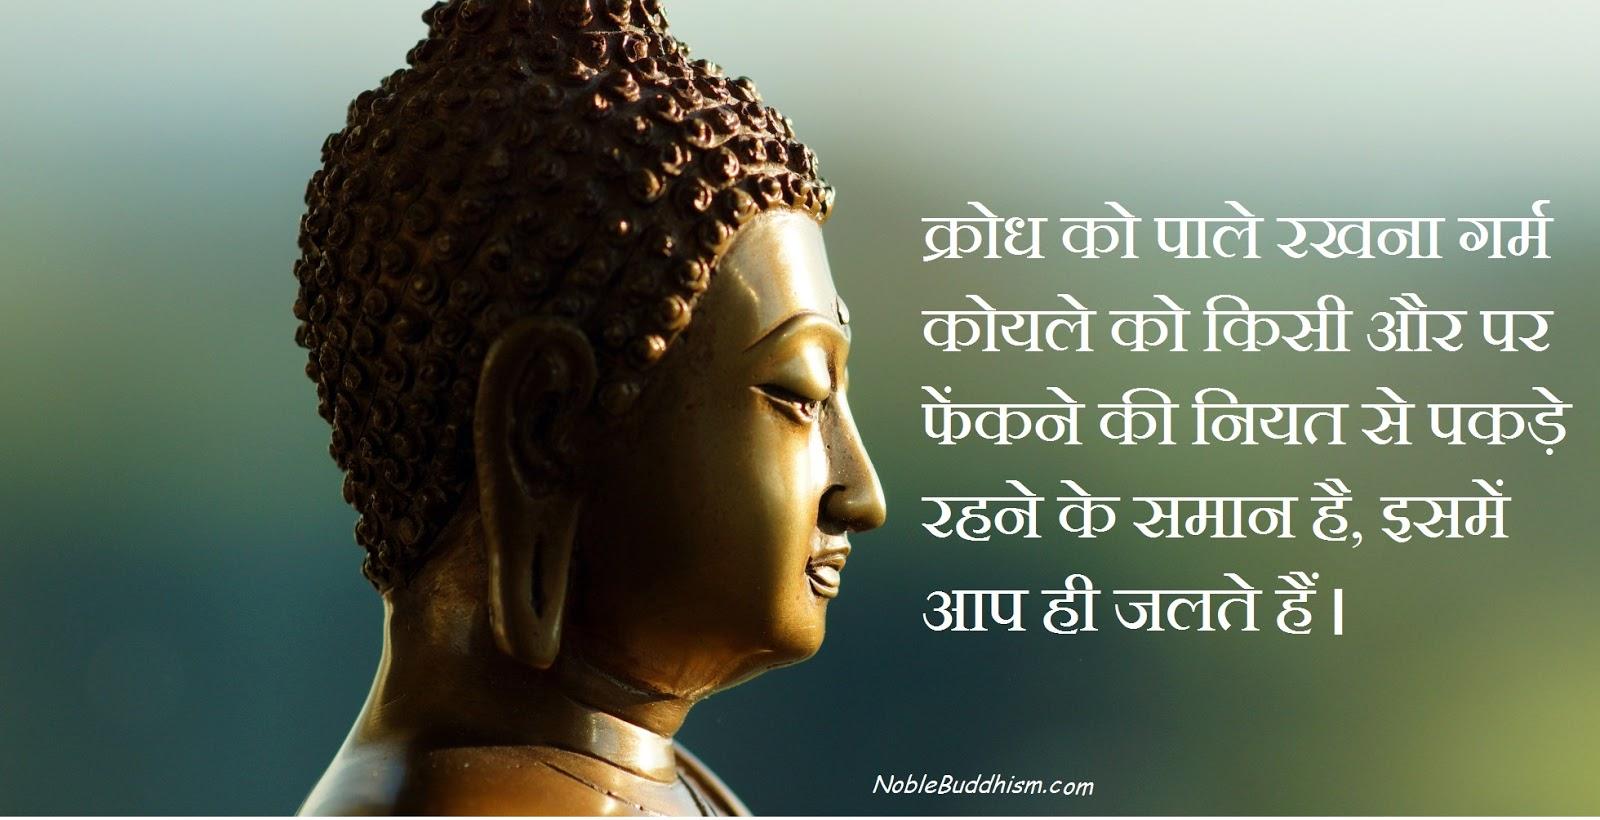 Zen Quote Wallpapers Anger Quotes Buddha Www Pixshark Com Images Galleries